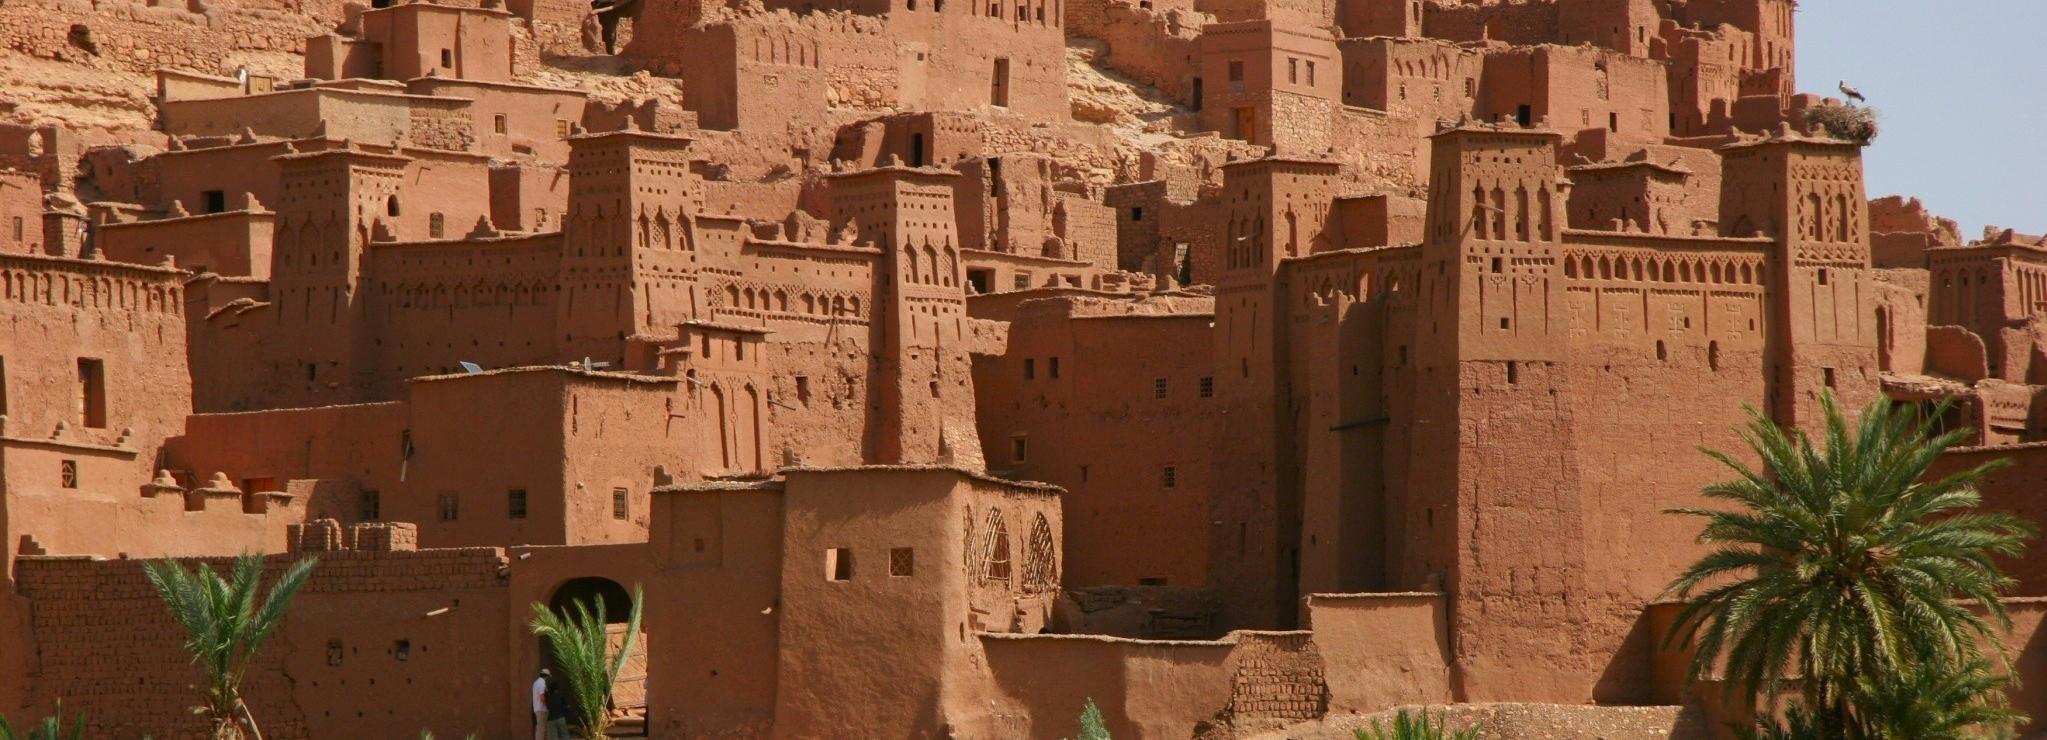 Ait-Ben-Haddou e Ouarzazate: gita privata da Marrakesh